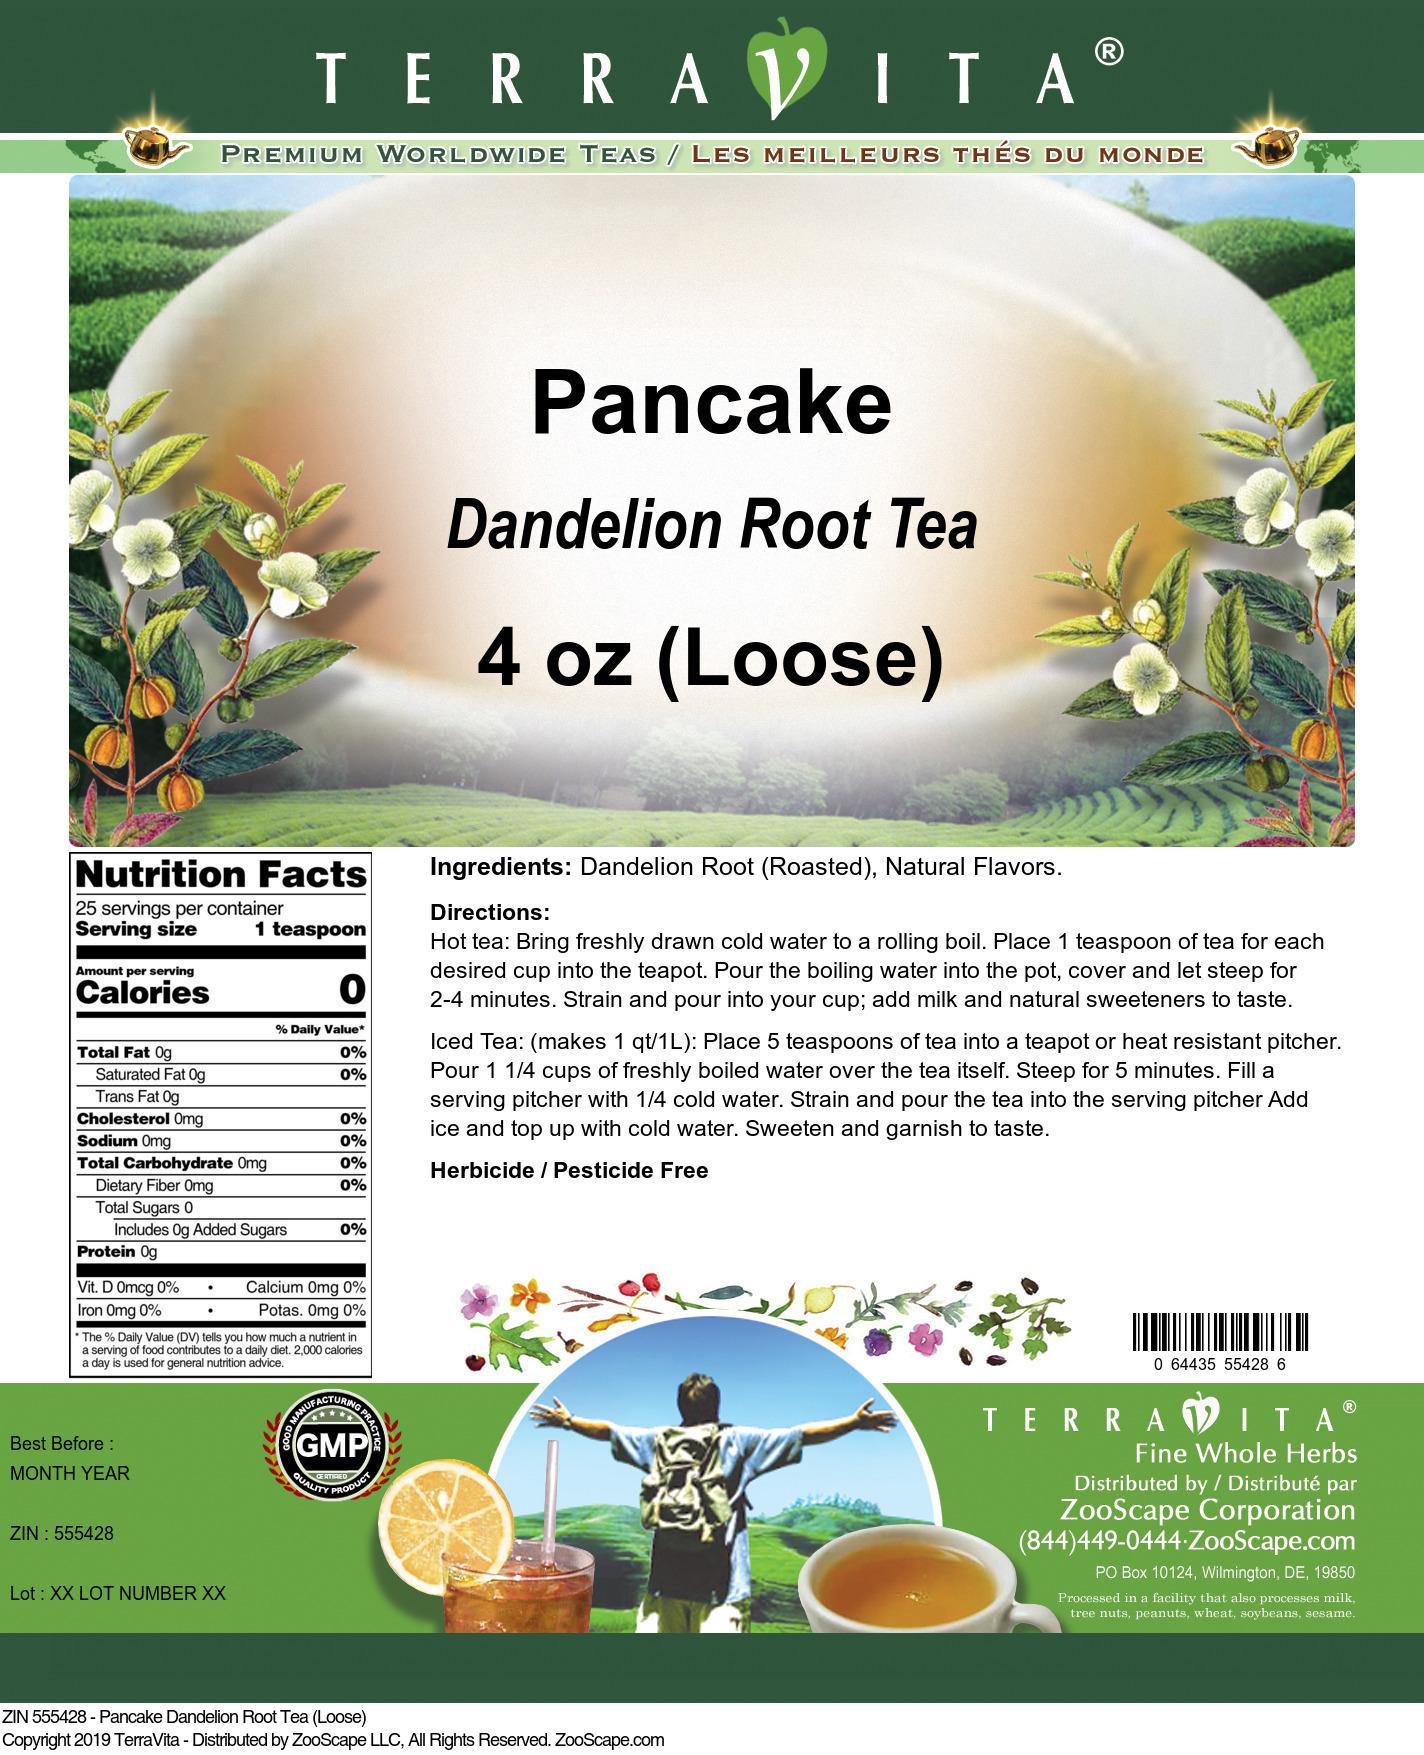 Pancake Dandelion Root Tea (Loose)